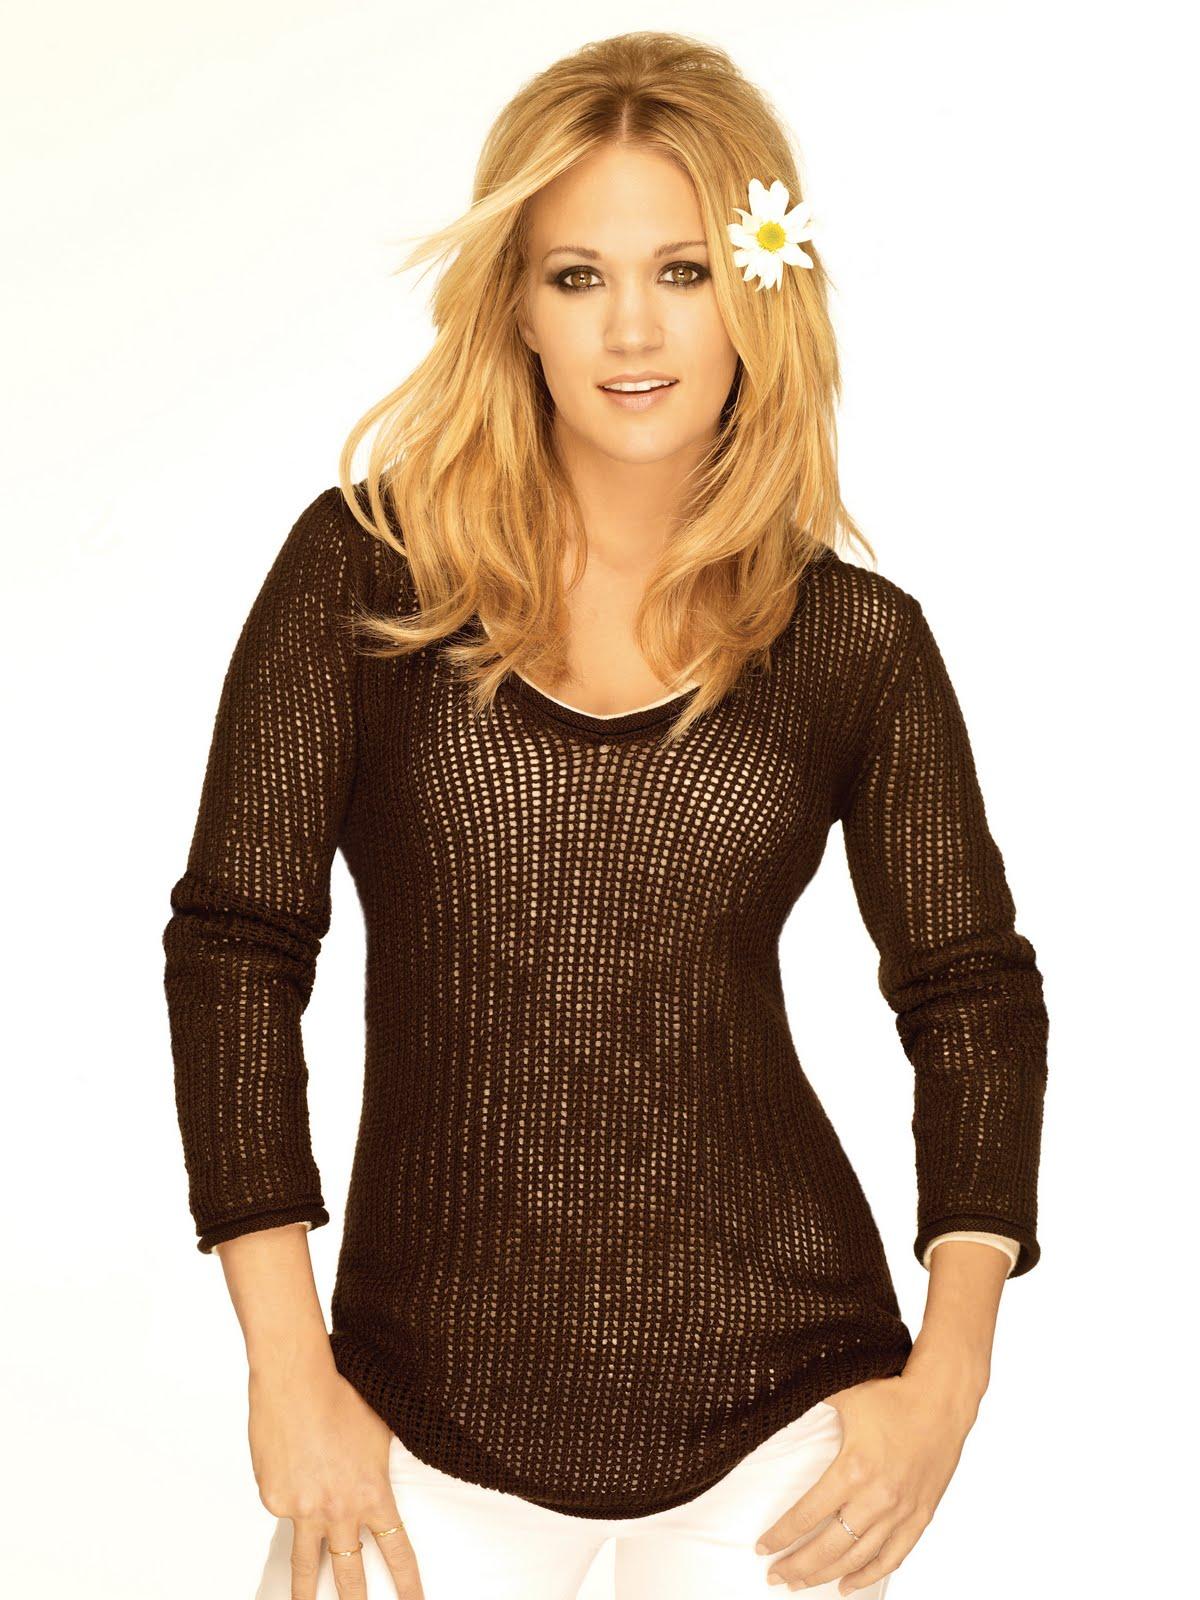 http://3.bp.blogspot.com/_XZ-NrM6Icko/SwomGiKQgVI/AAAAAAAAB4g/nHSICdQ18ck/s1600/Carrie+Underwood.jpg